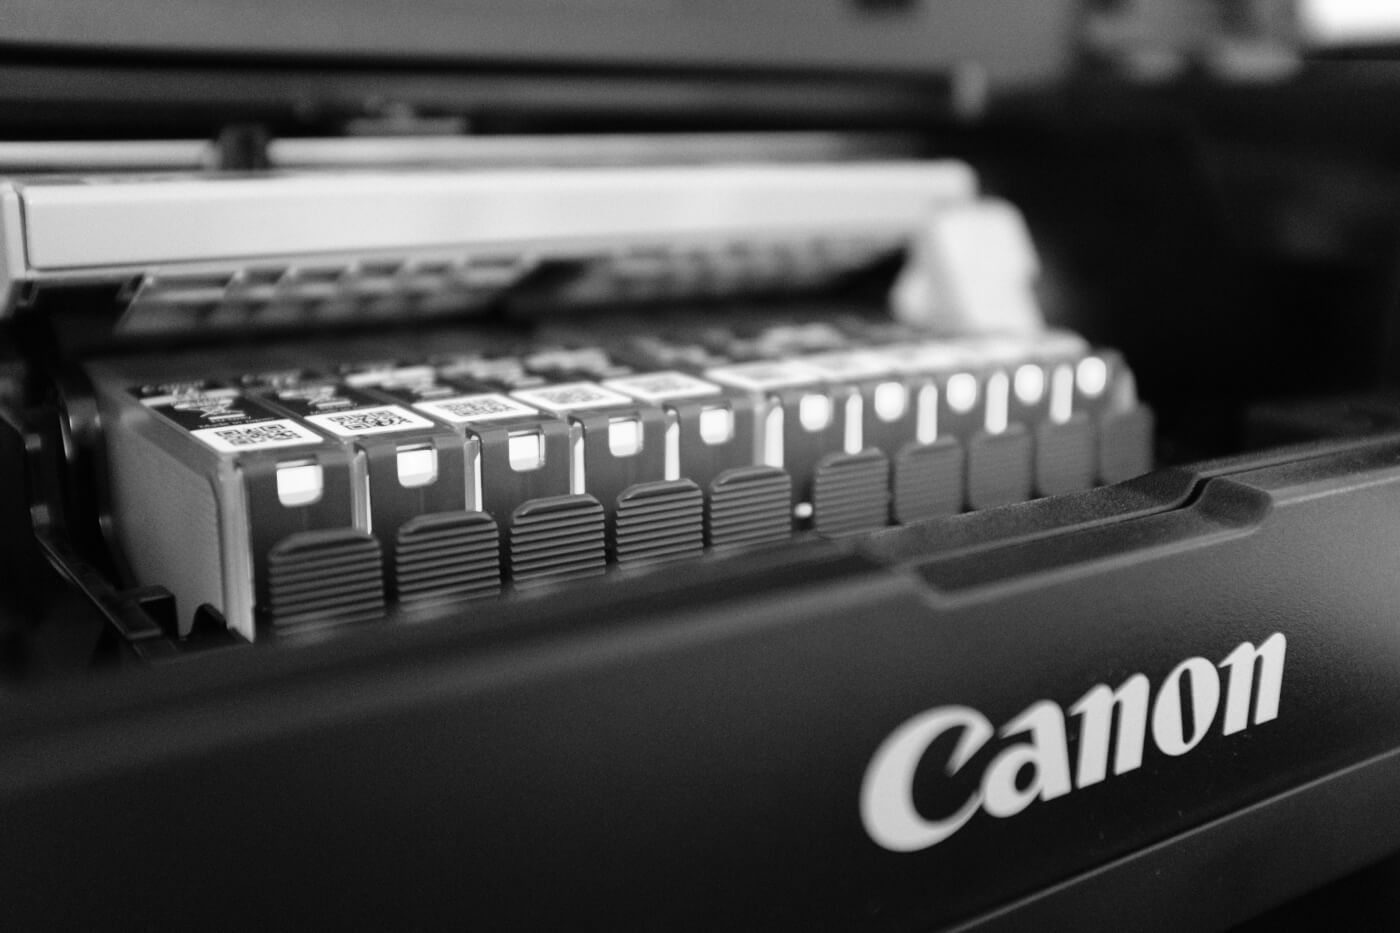 Canon Pixma Pro 10s - Joakim Jormelin